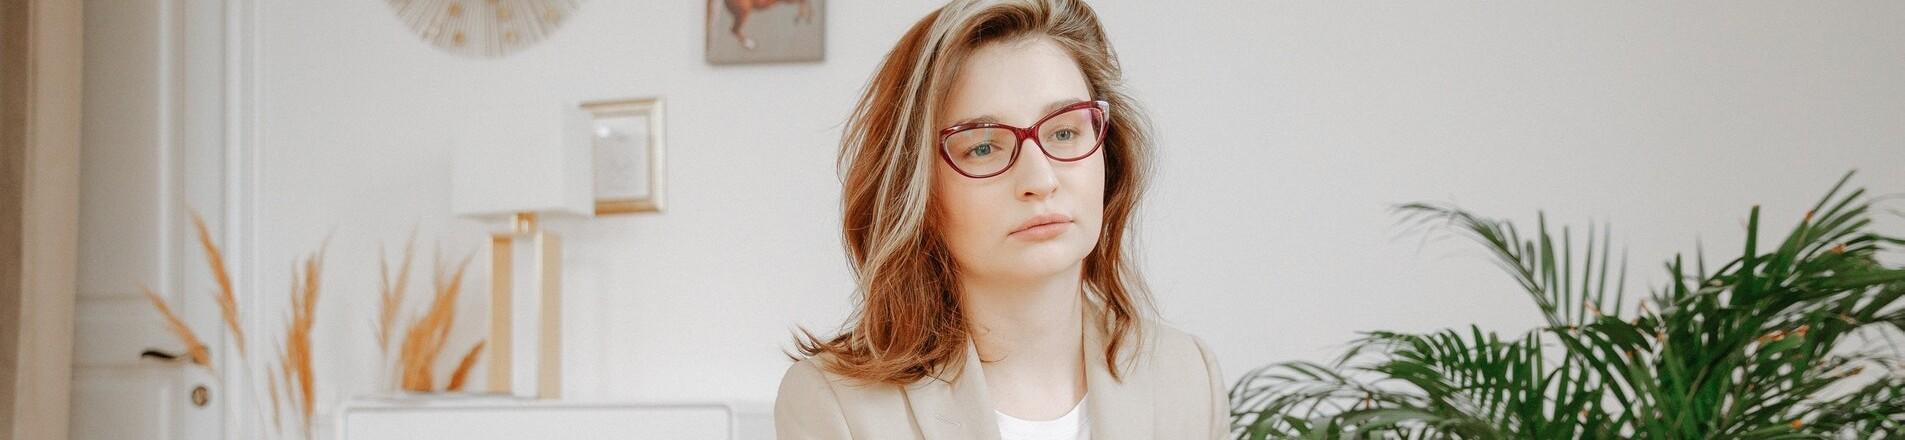 Female entrepreneurs create new jobs across North West